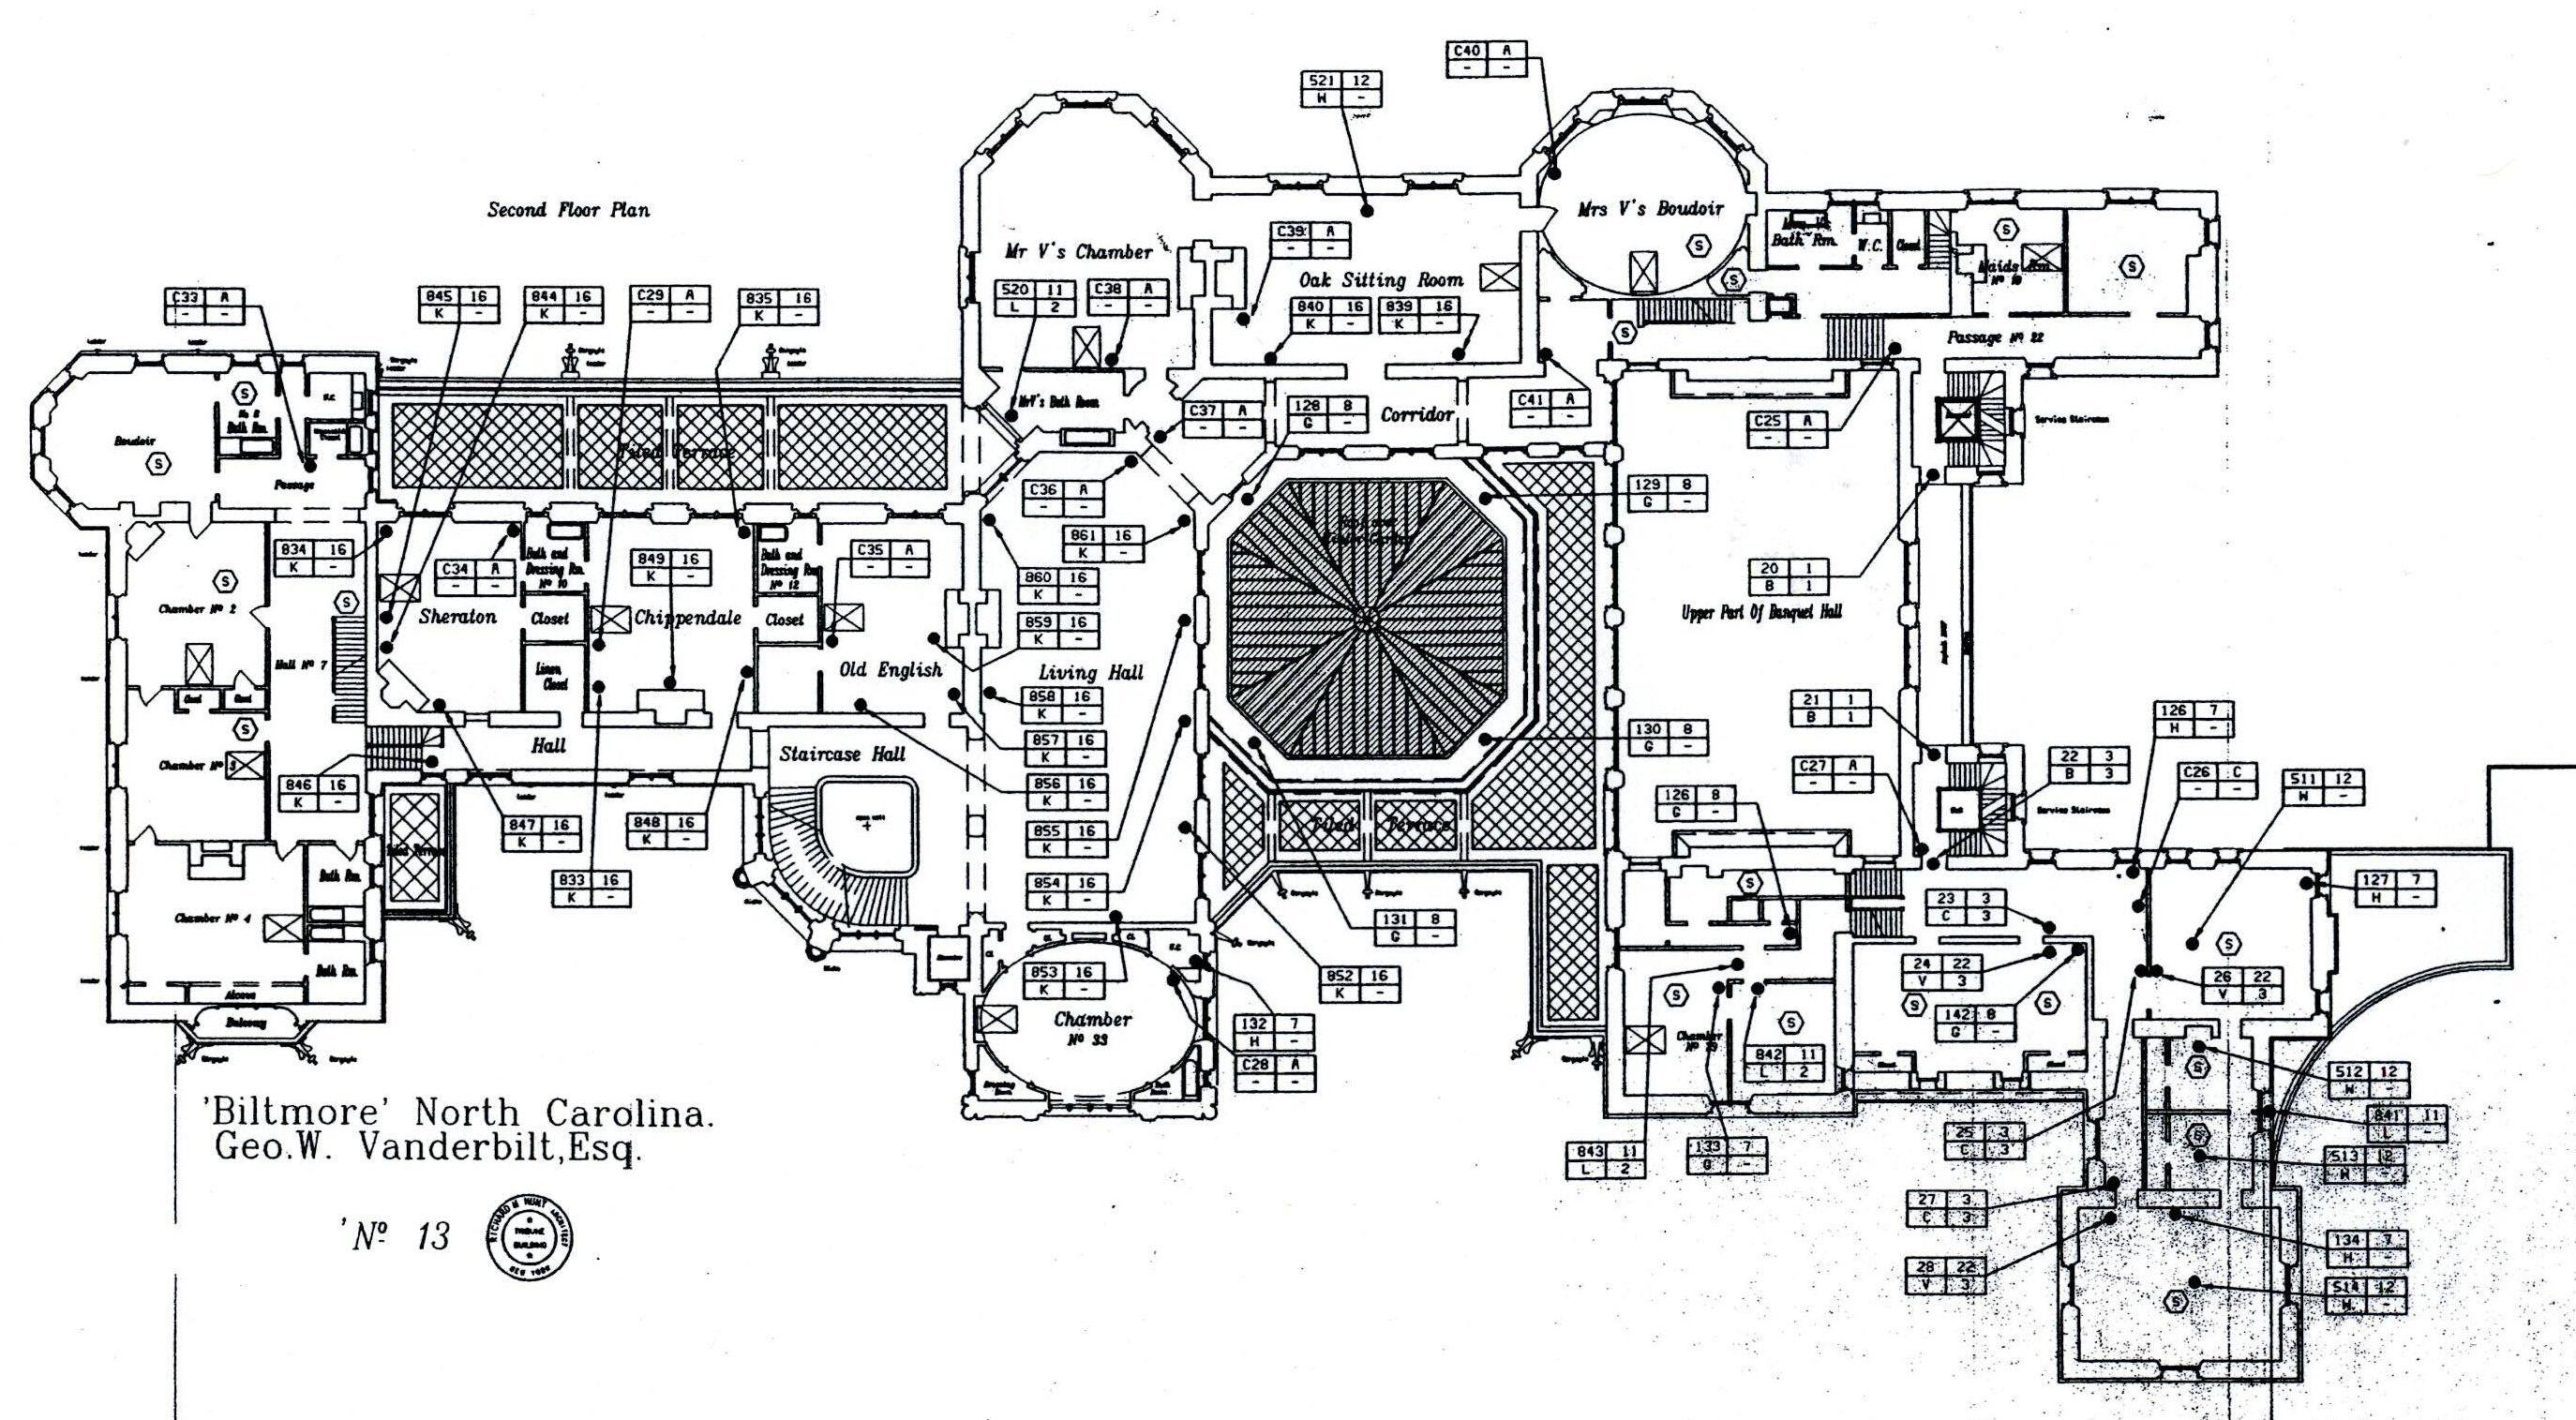 11e21918b9e473942e88688c04c57b0b biltmore house 2nd floor floorplan biltmore estate 2nd floor,Biltmore House Plans